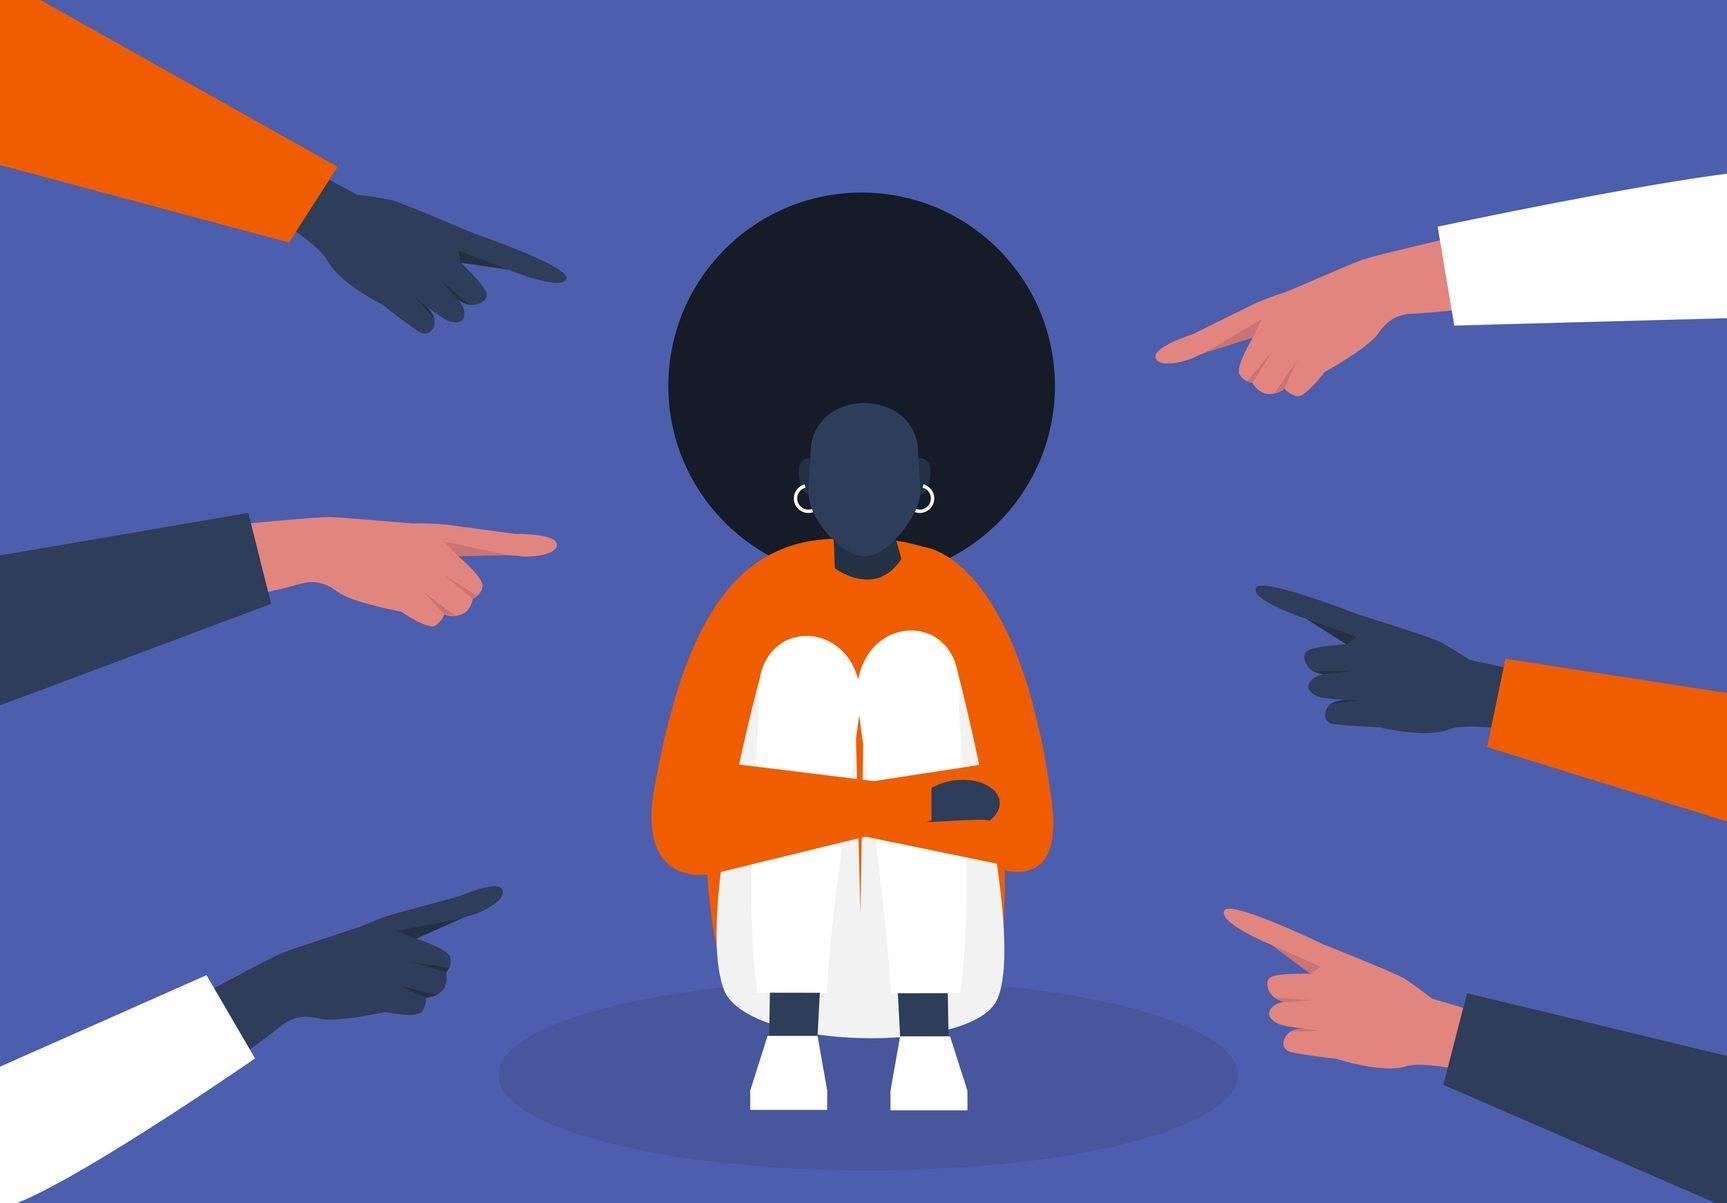 www.juicysantos.com.br - mulher negra sendo vítima de racismo